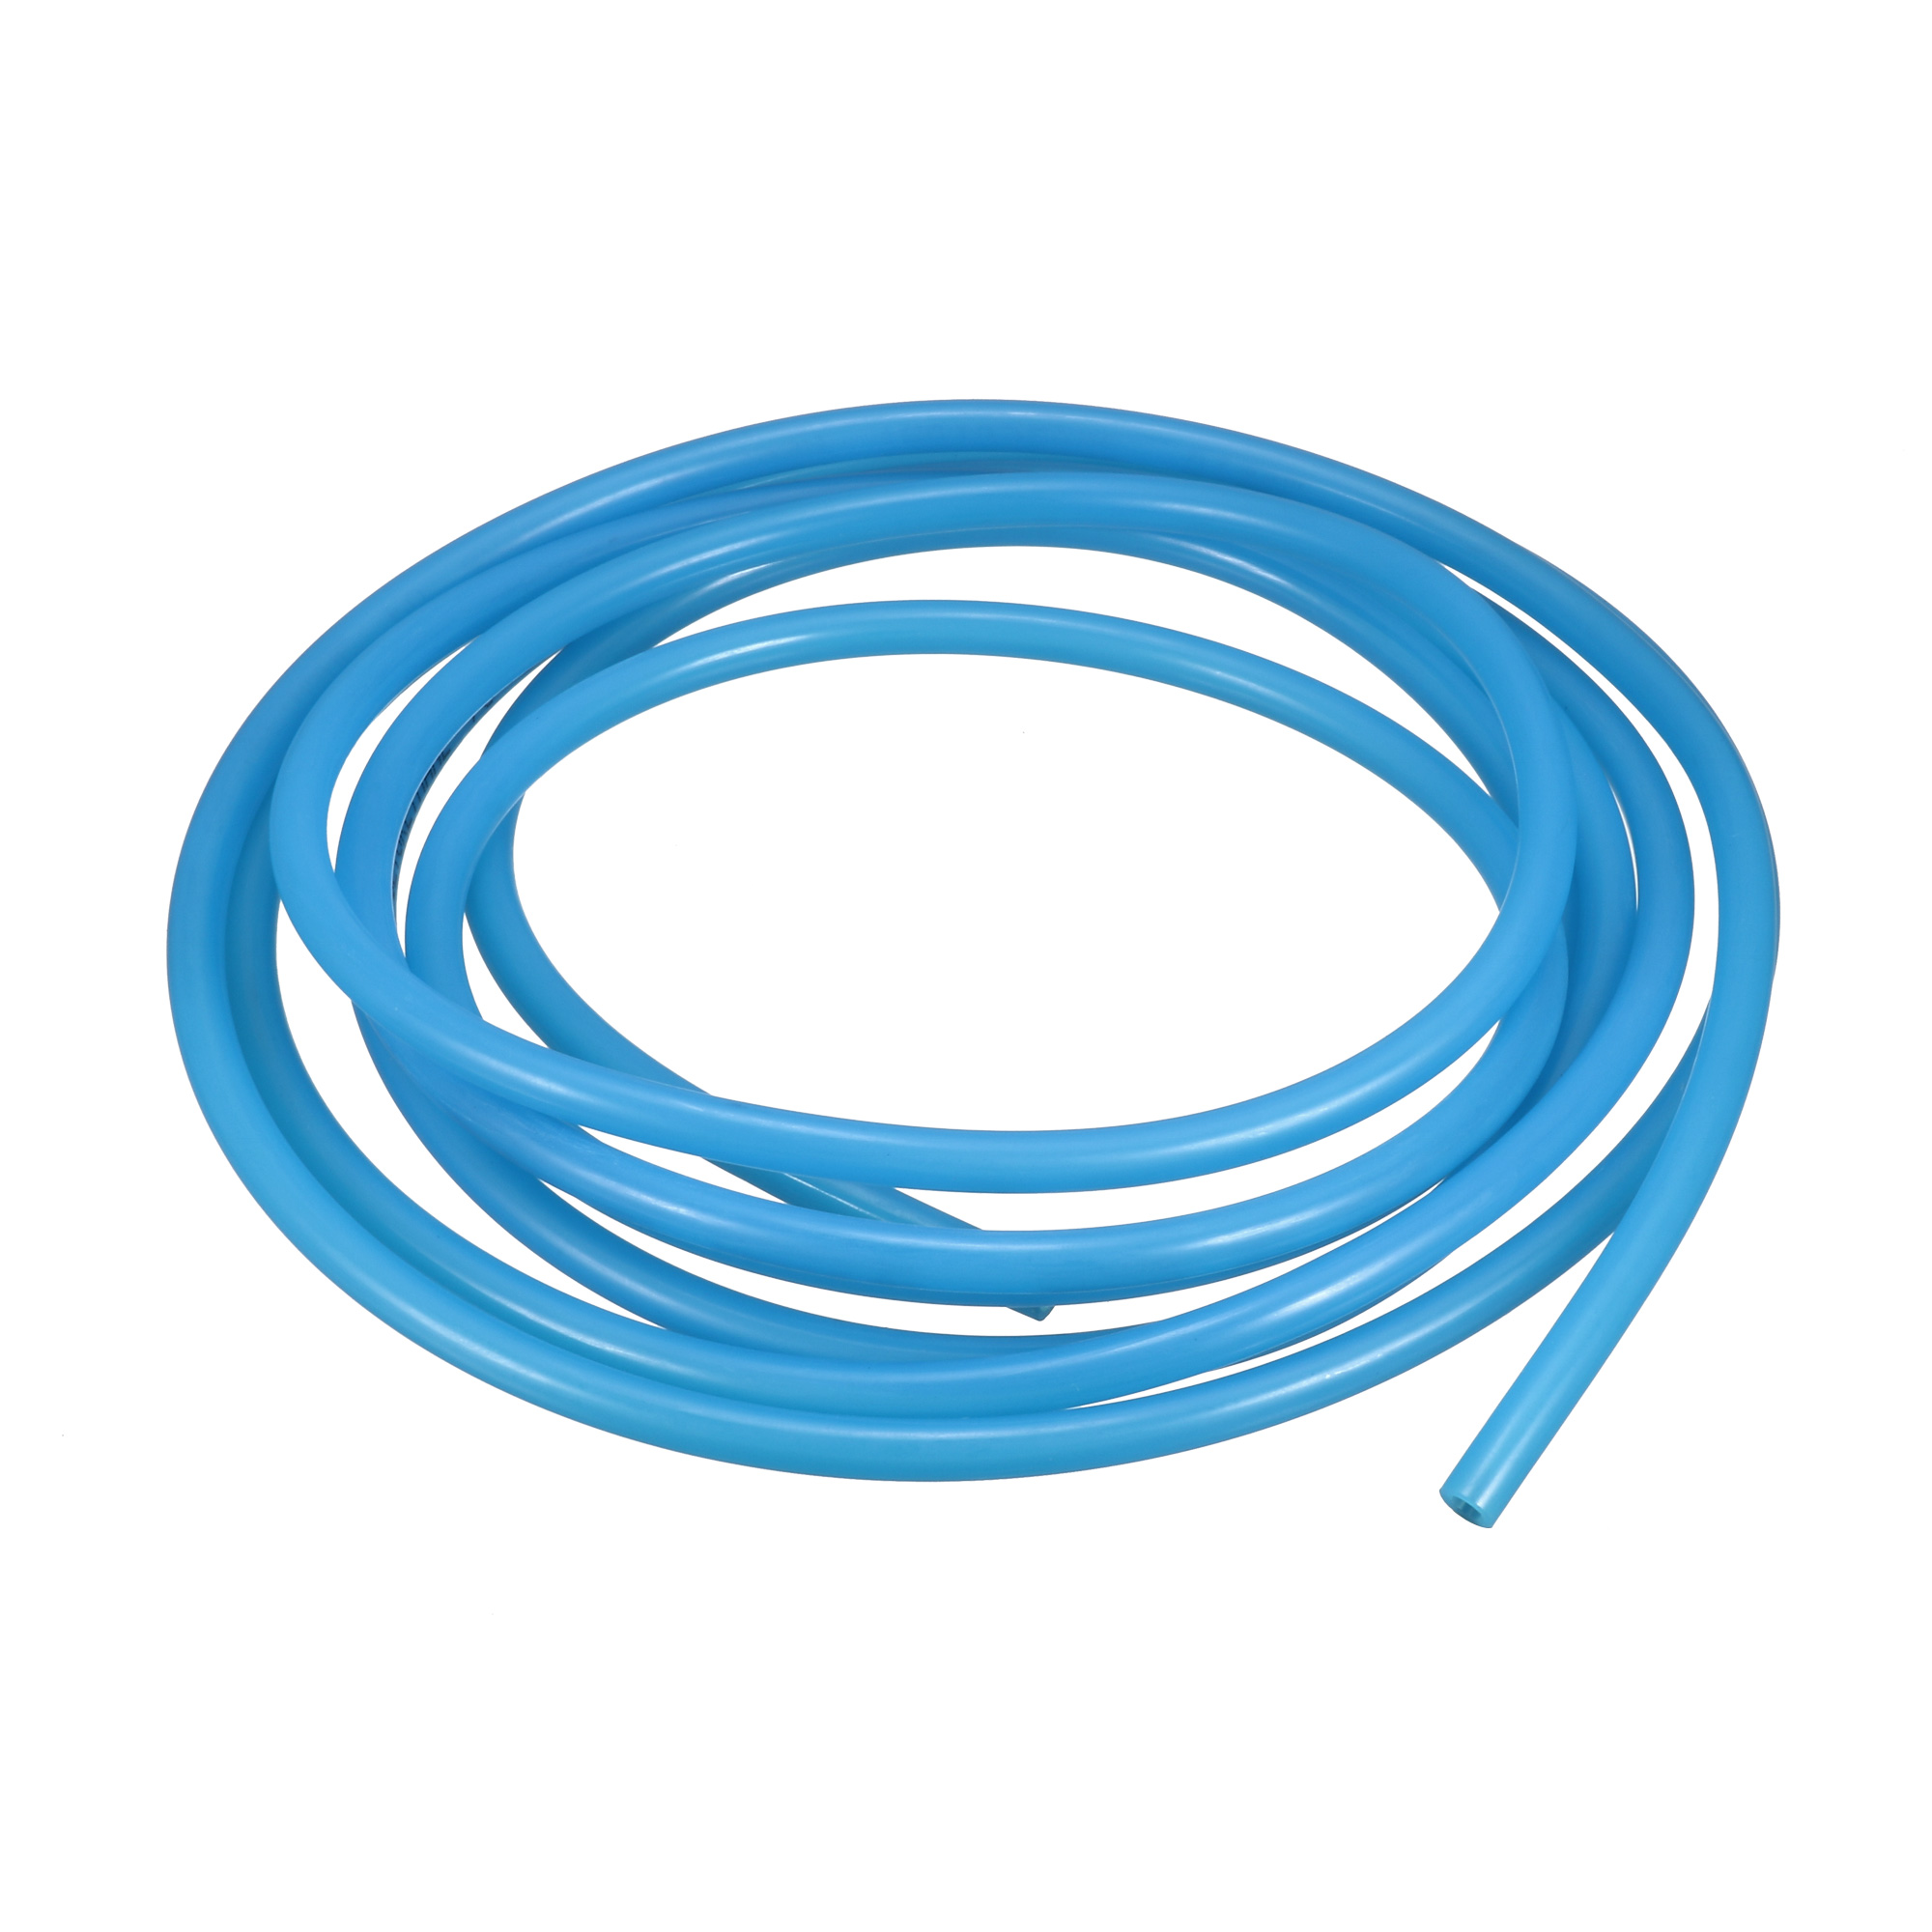 Flexible Drauble PU Tube Pneumatic Polyurethane 6mm x 4mm Hose 3 Meters Long Blue